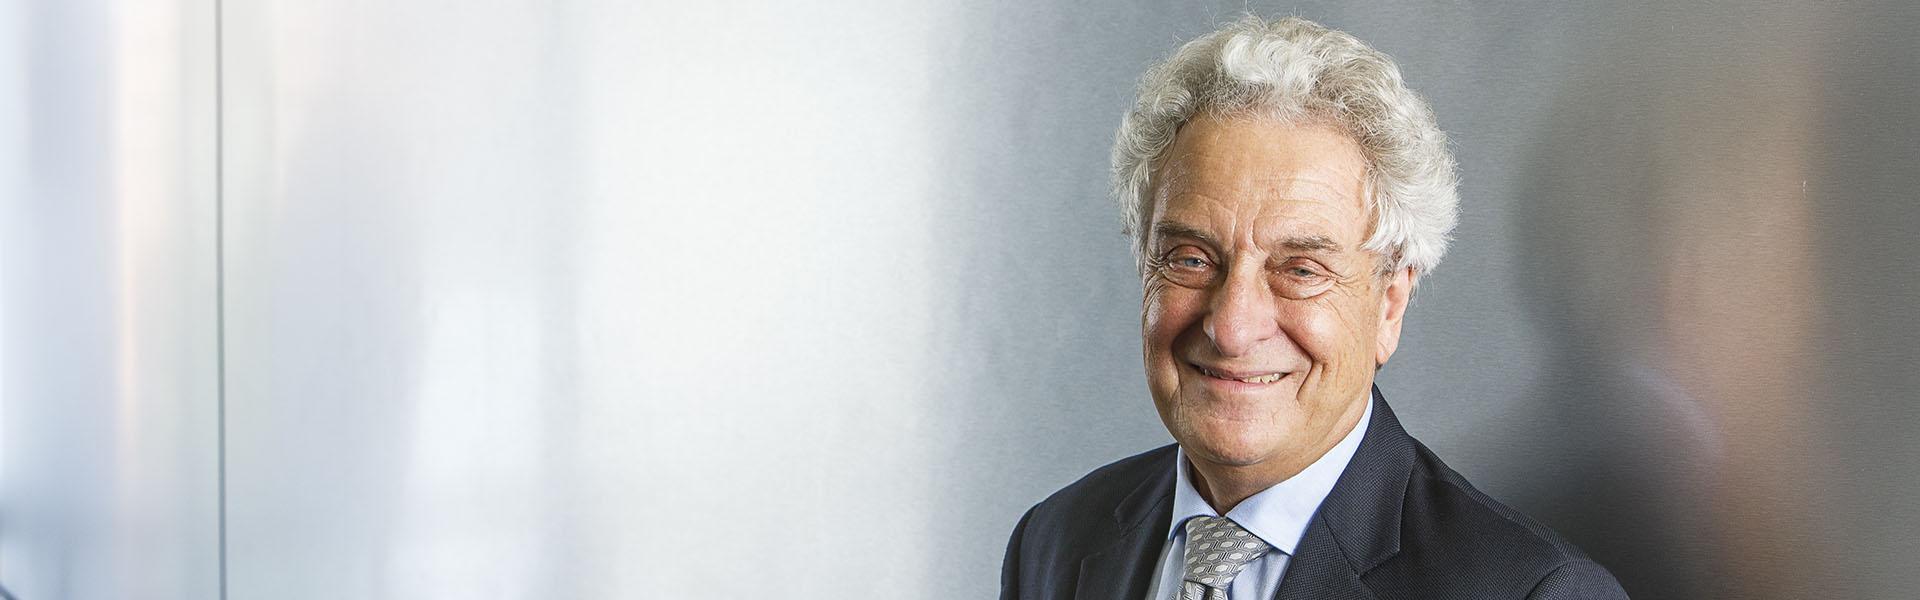 John Piggott CEPAR Director UNSW economist